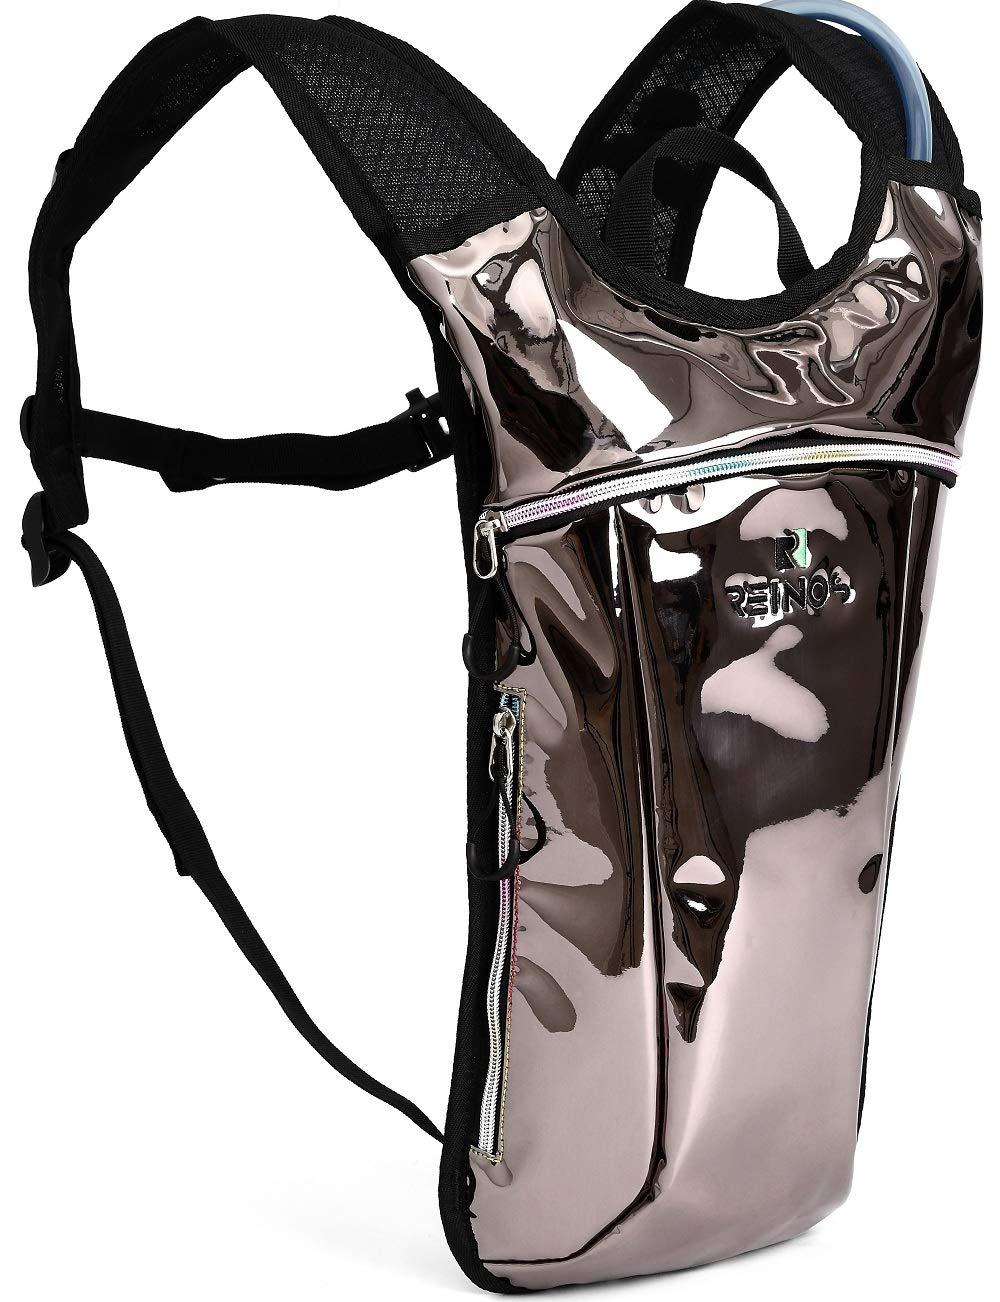 Hydration Backpack – Light Water Pack – 2L Water Bladder Included for Running, Hiking, Biking, Festivals, Raves